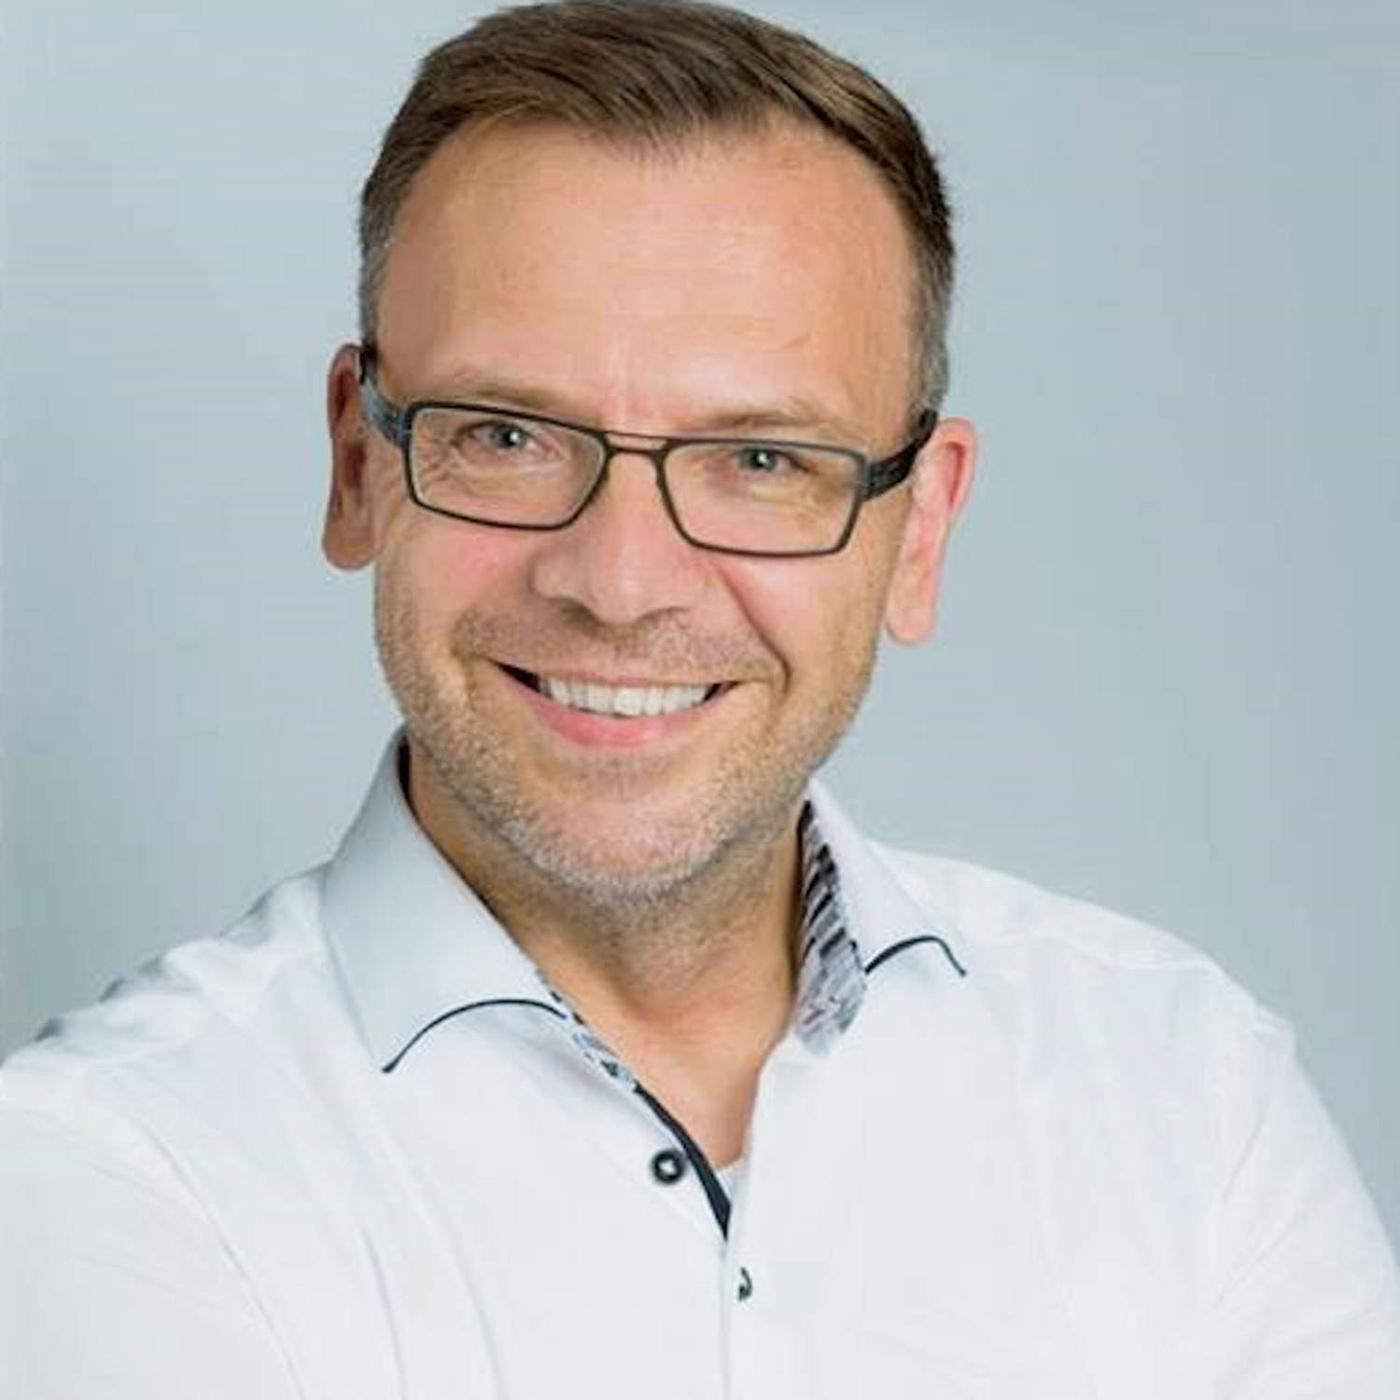 Bürgermeisterkandidat Torsten Tschigor